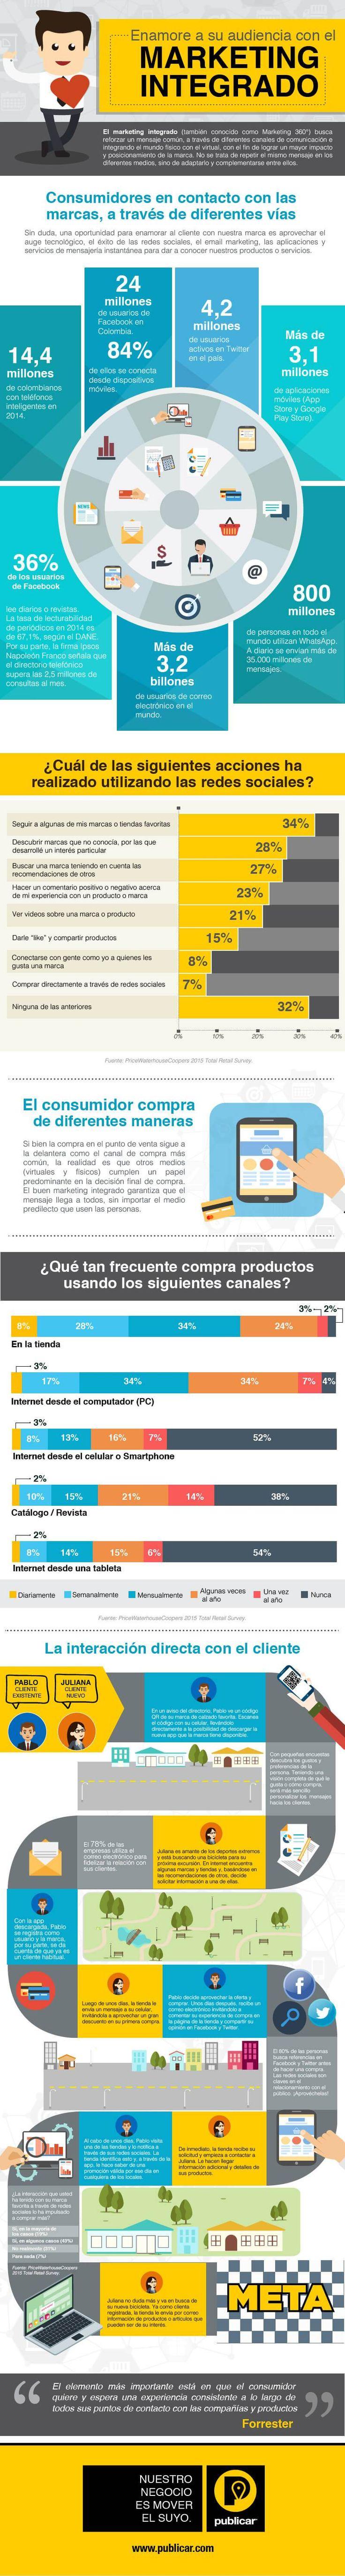 Marketing Integrado: cómo enamorar a tu audiencia #infografia #infographic #marketing